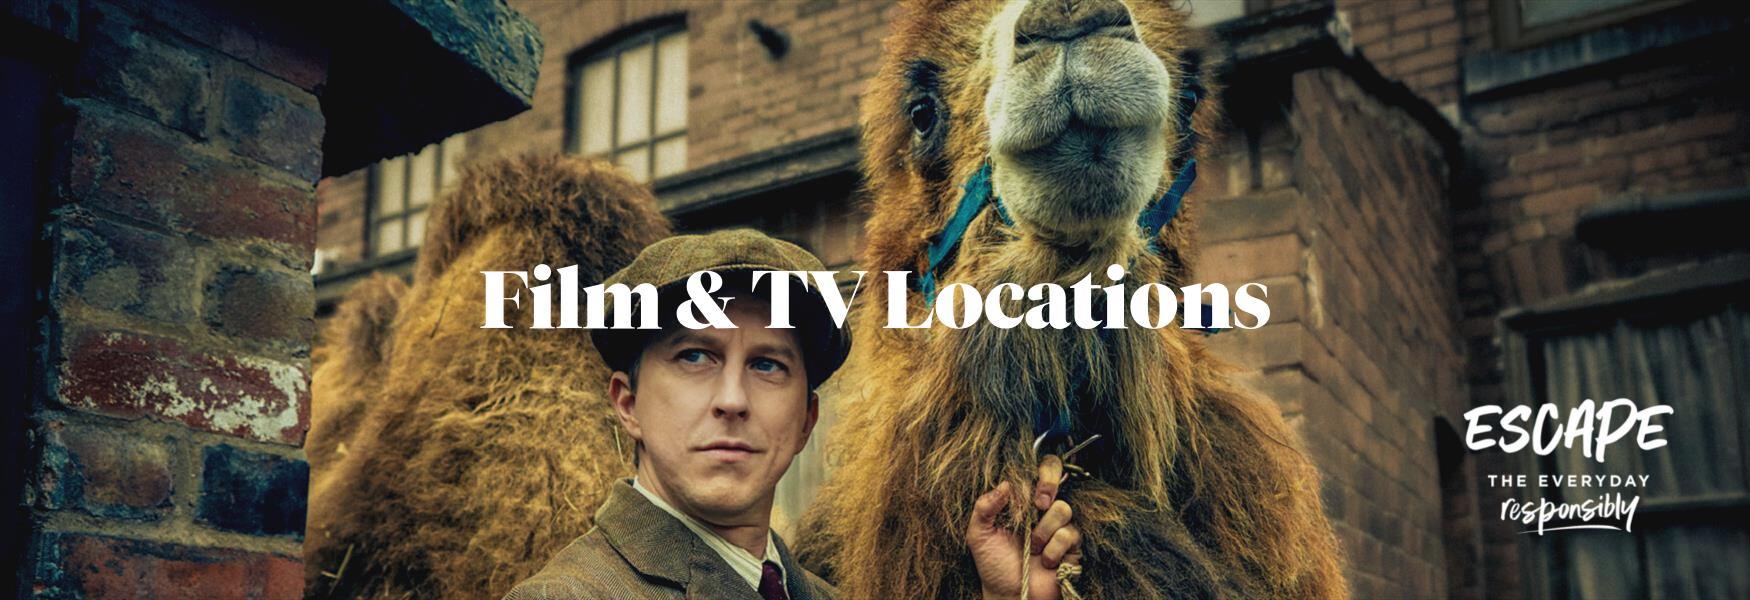 TV & Film locations in Cheshire